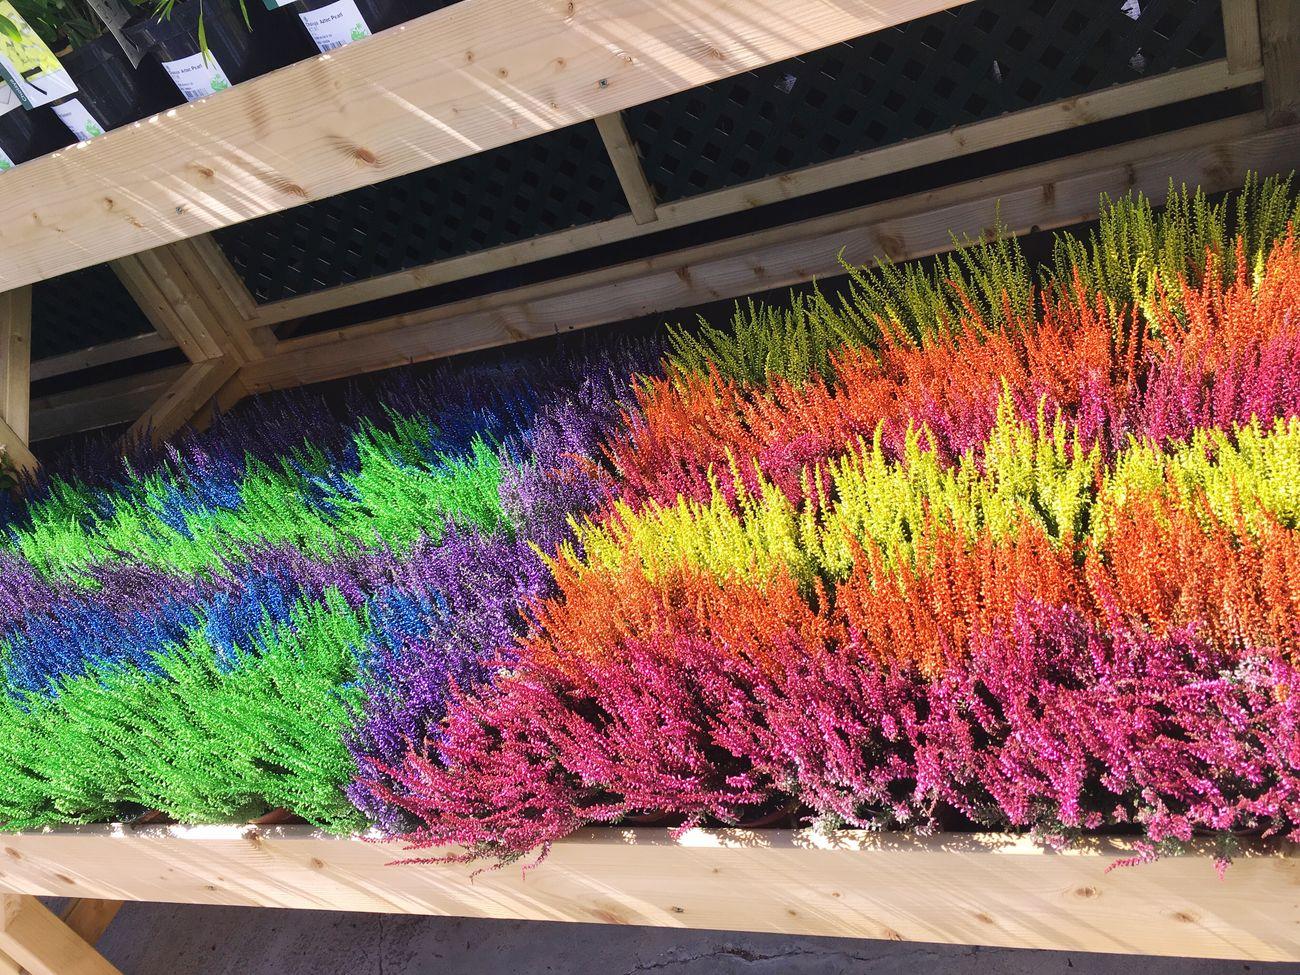 EyeEm Diversity Multi Colored Nature